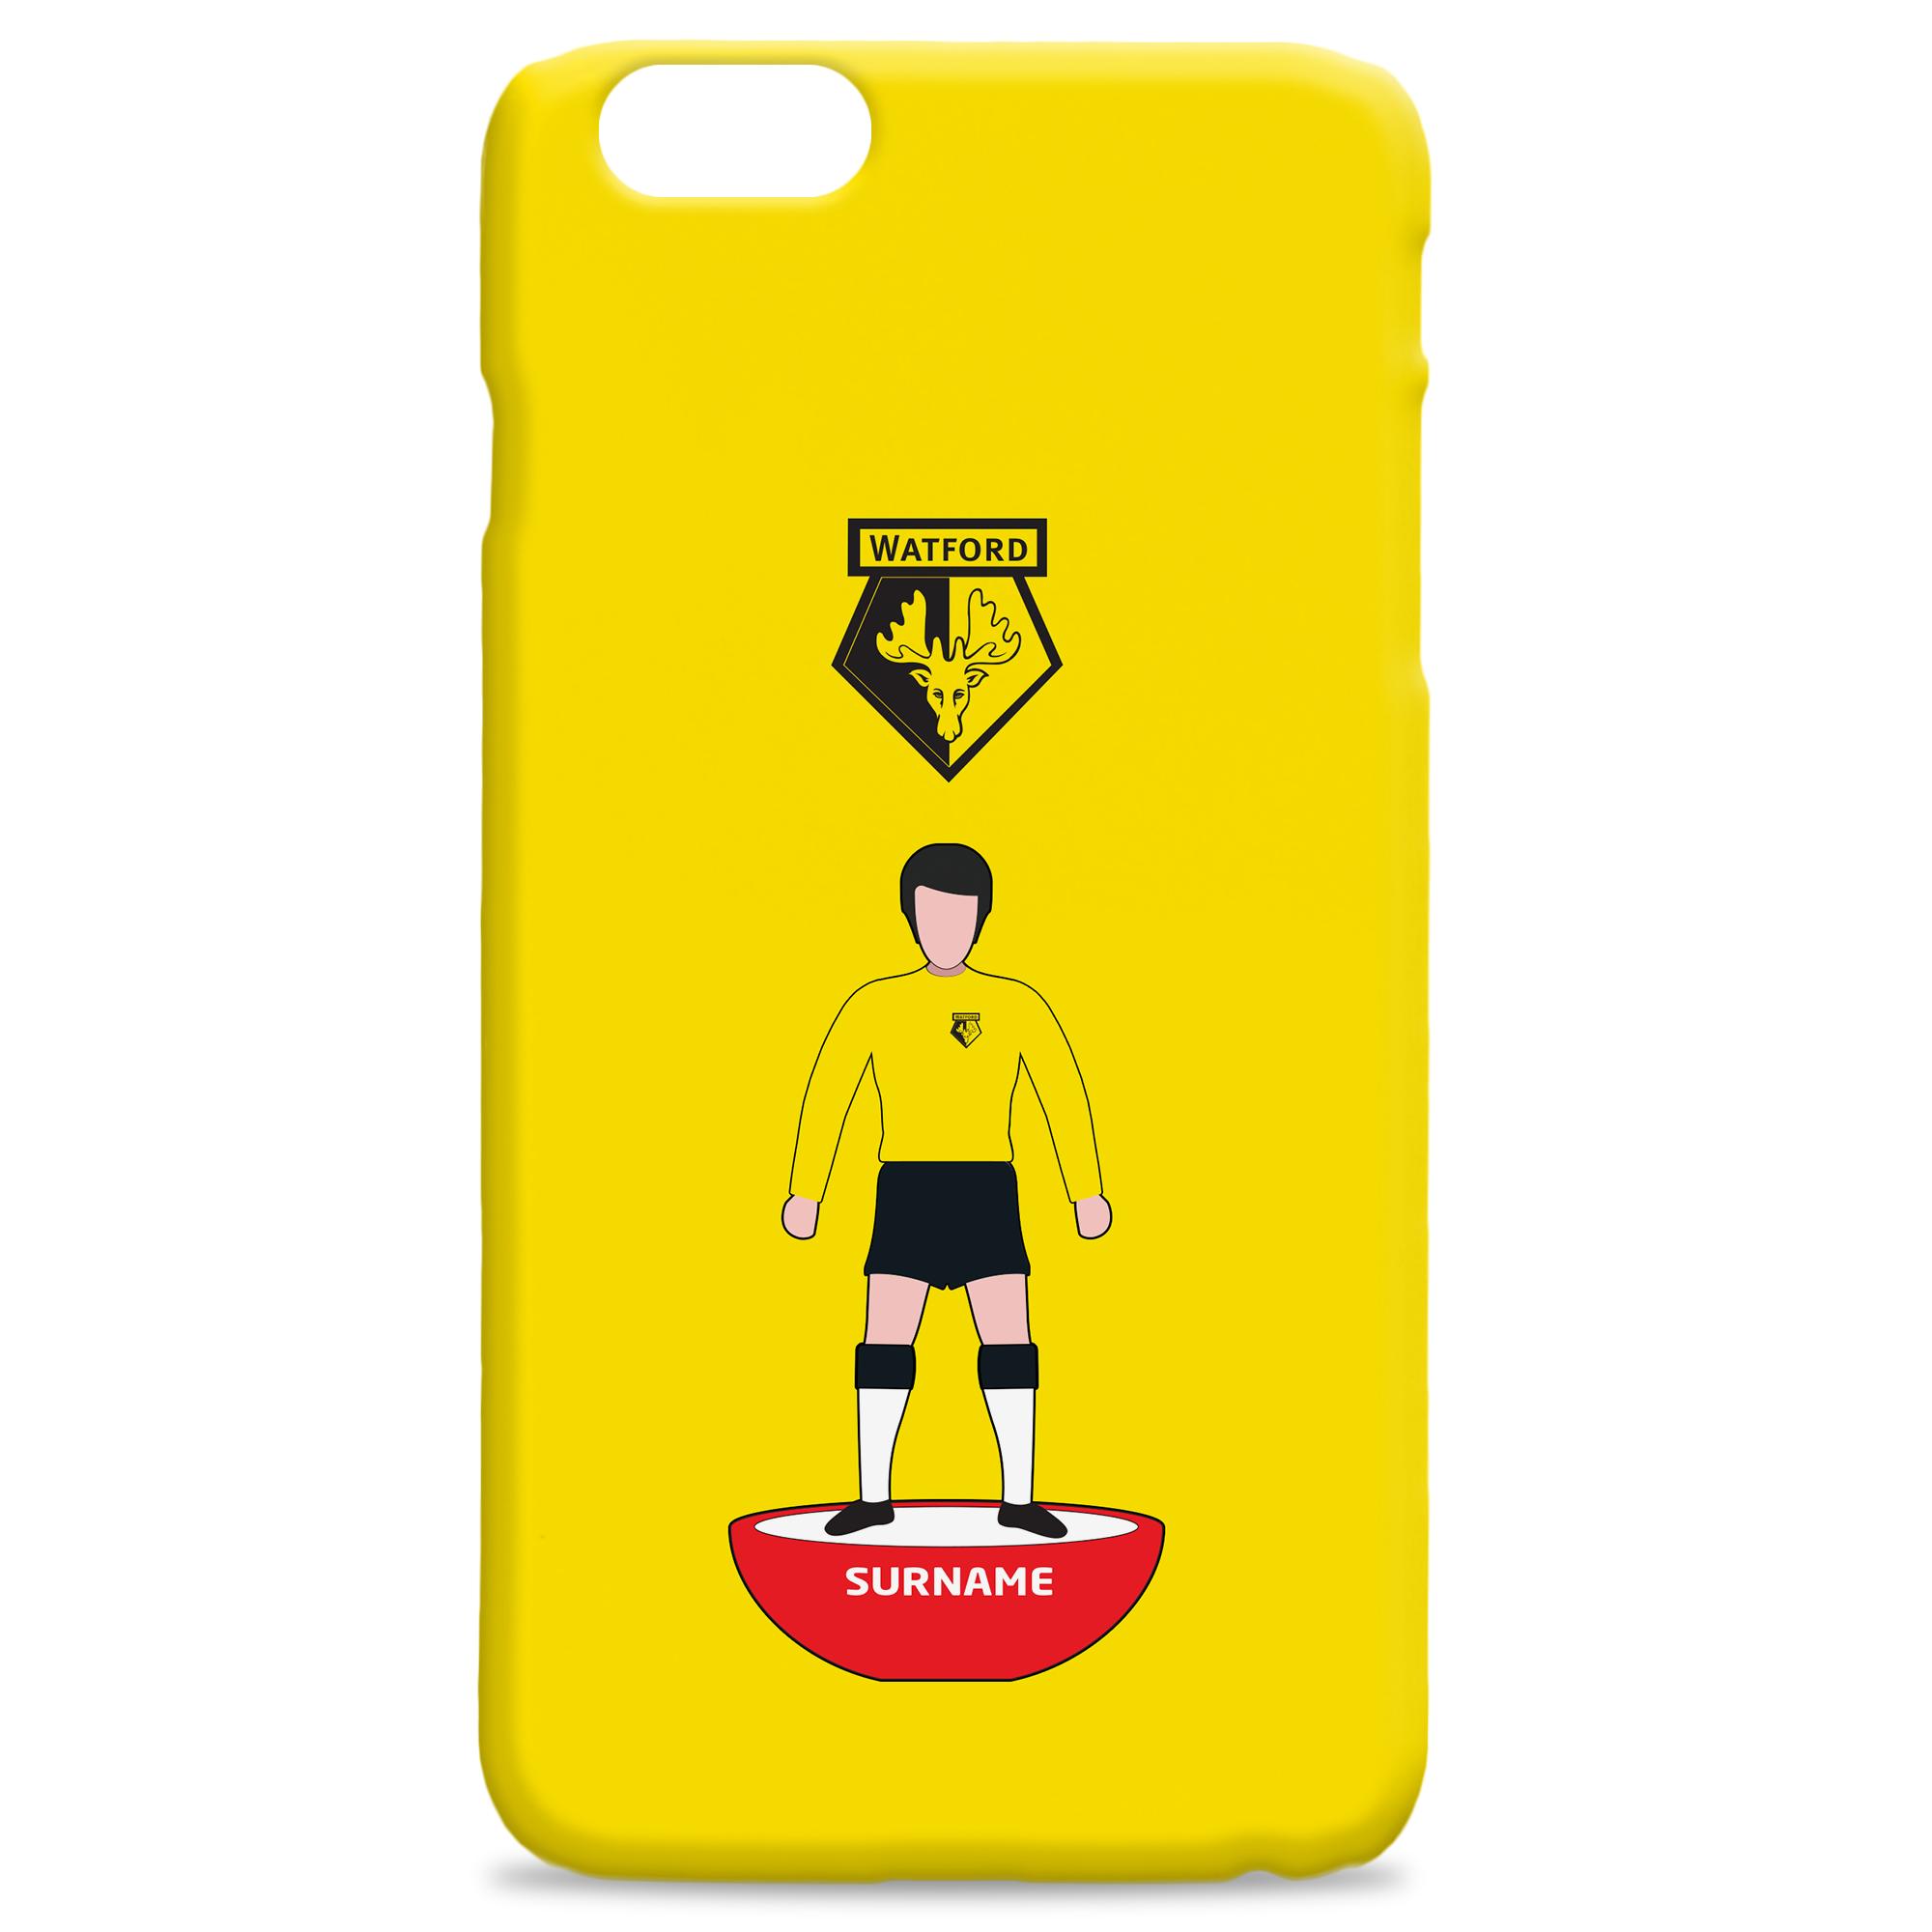 online retailer f3c64 c336d Personalised Watford FC Phone Cases